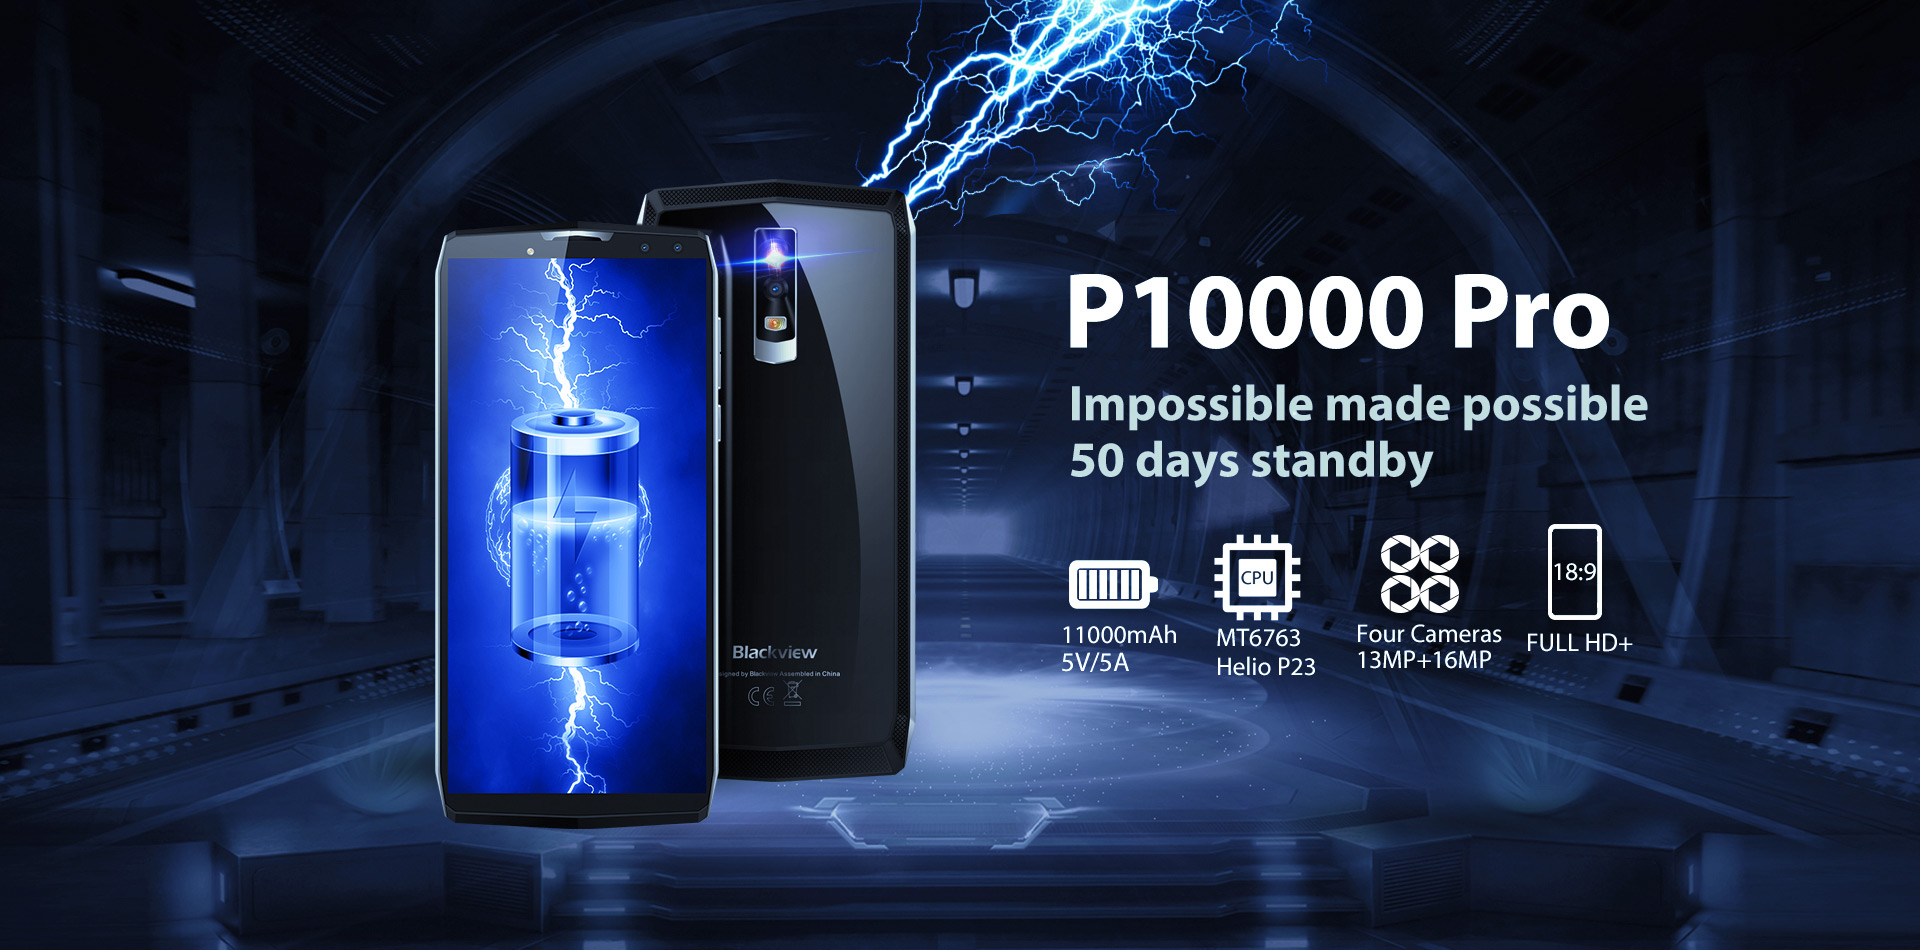 Smartphone Blackview P1000 Pro